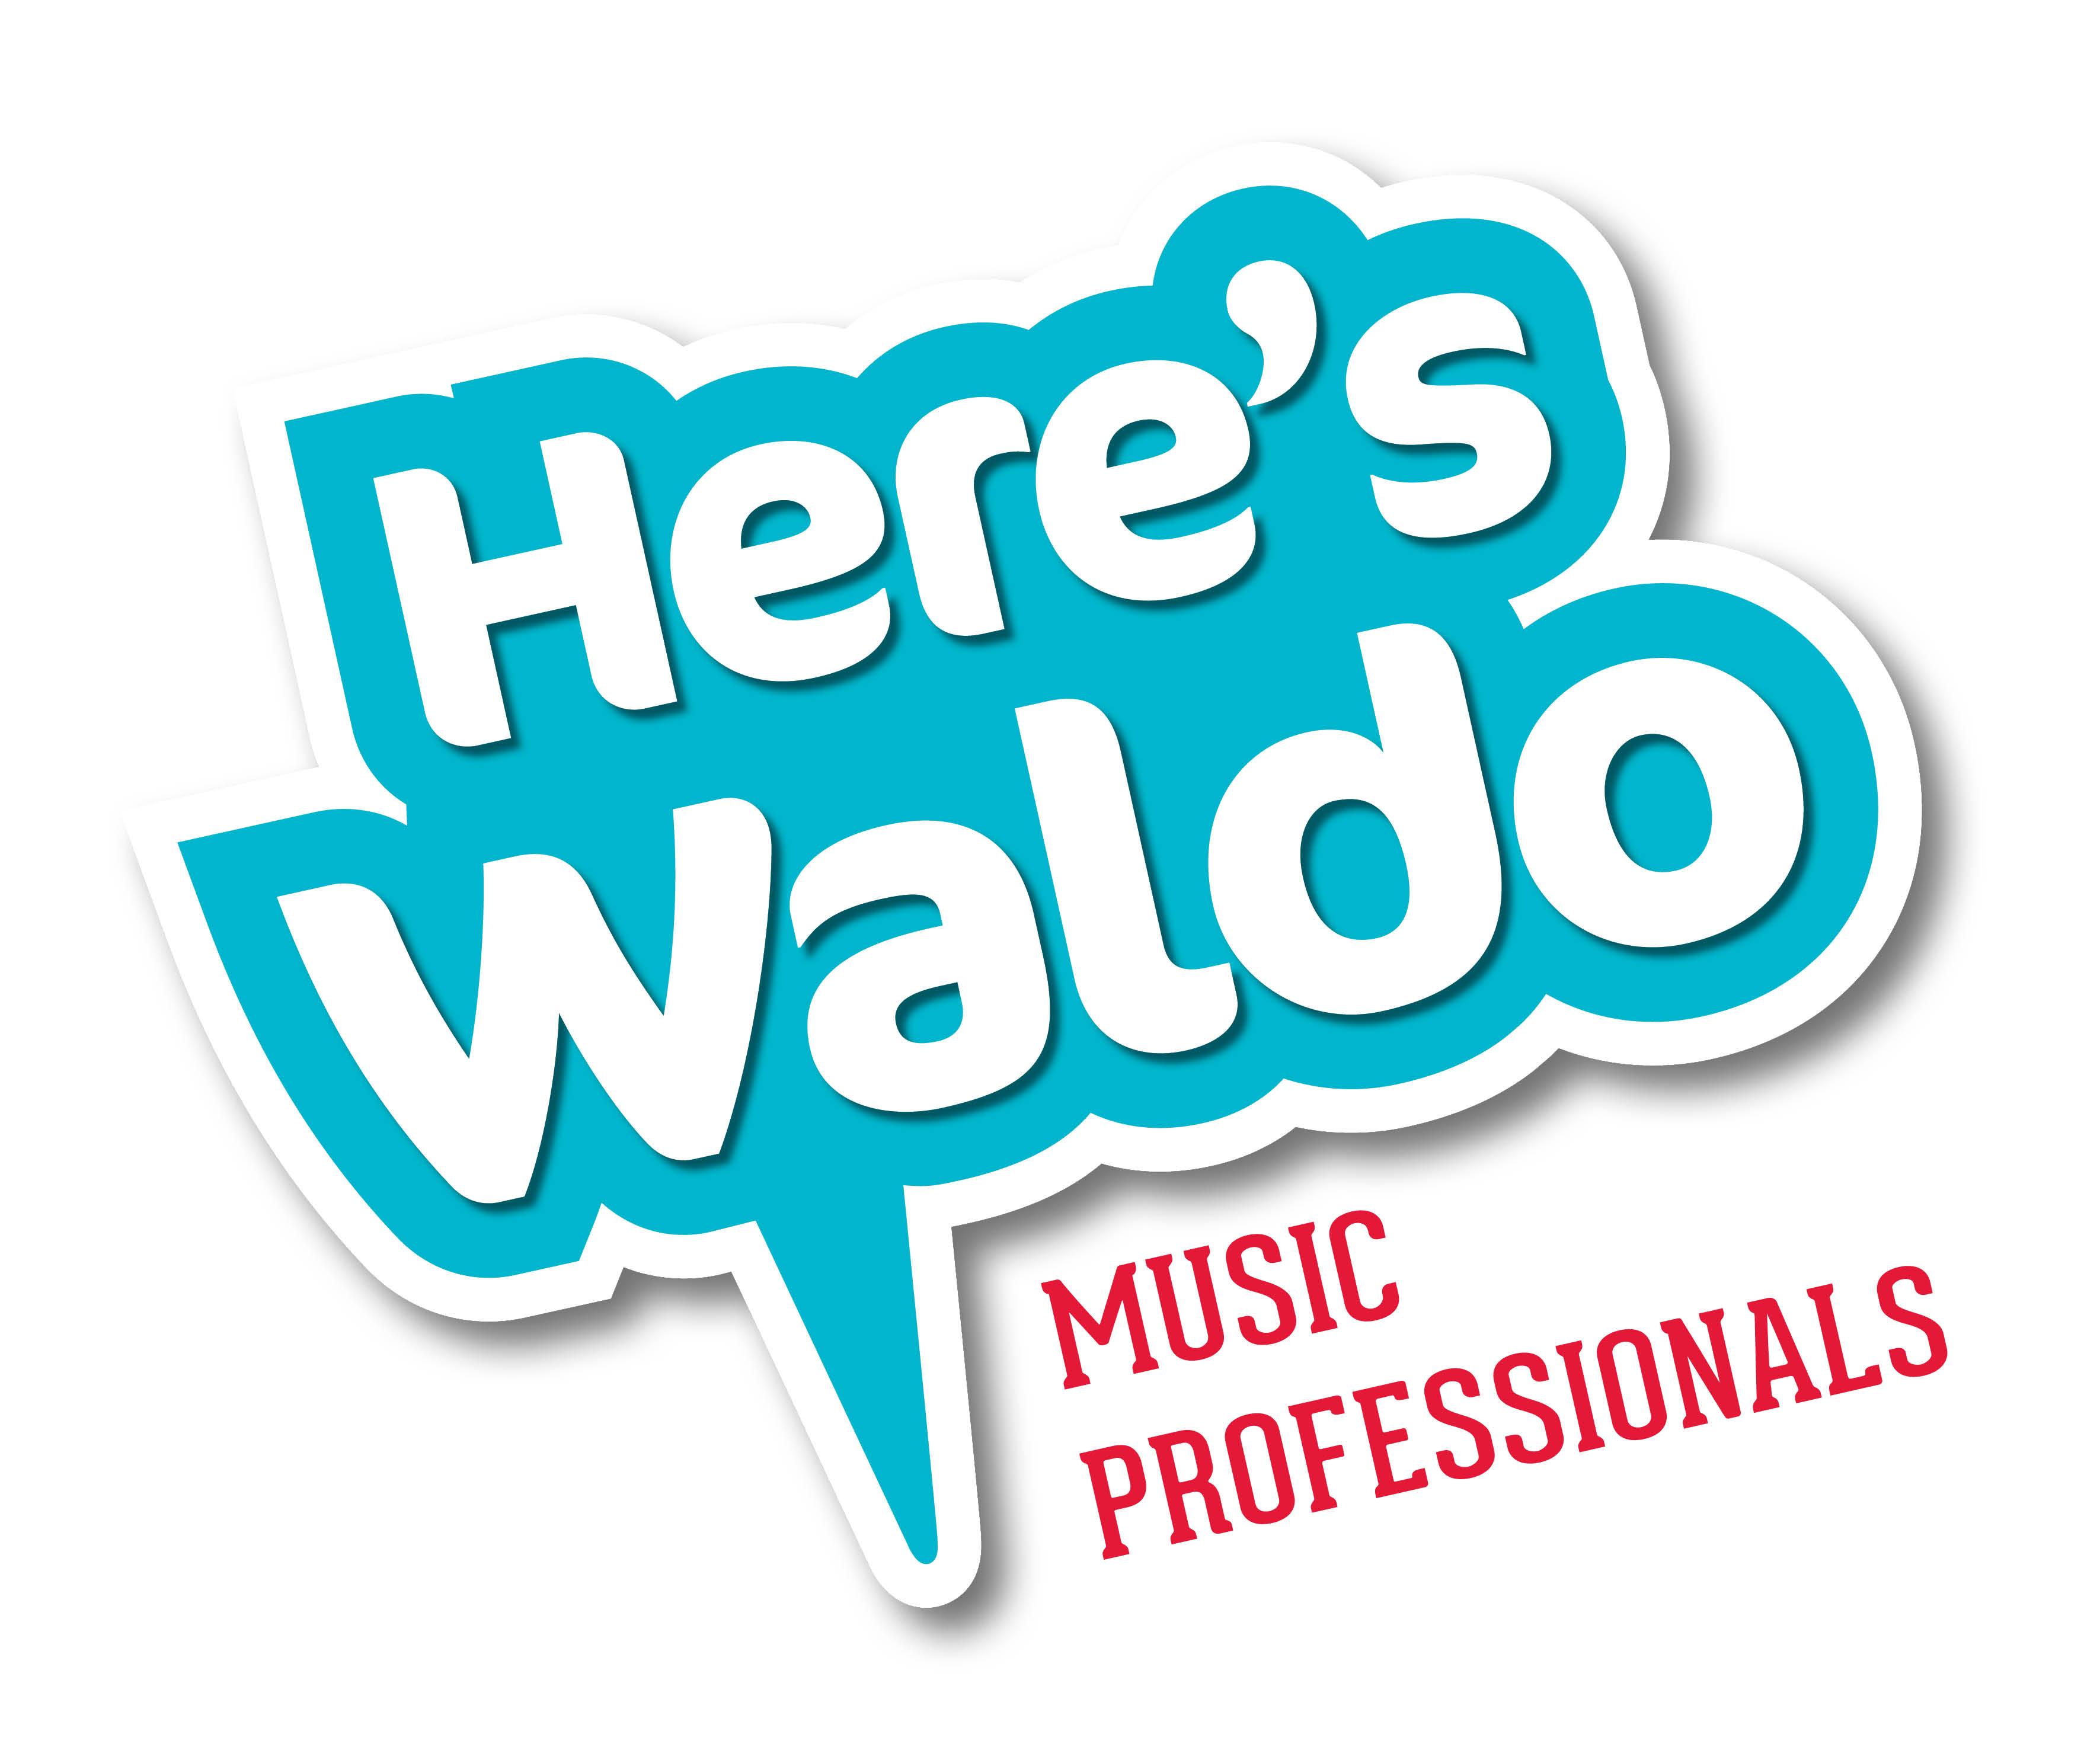 Here's Waldo